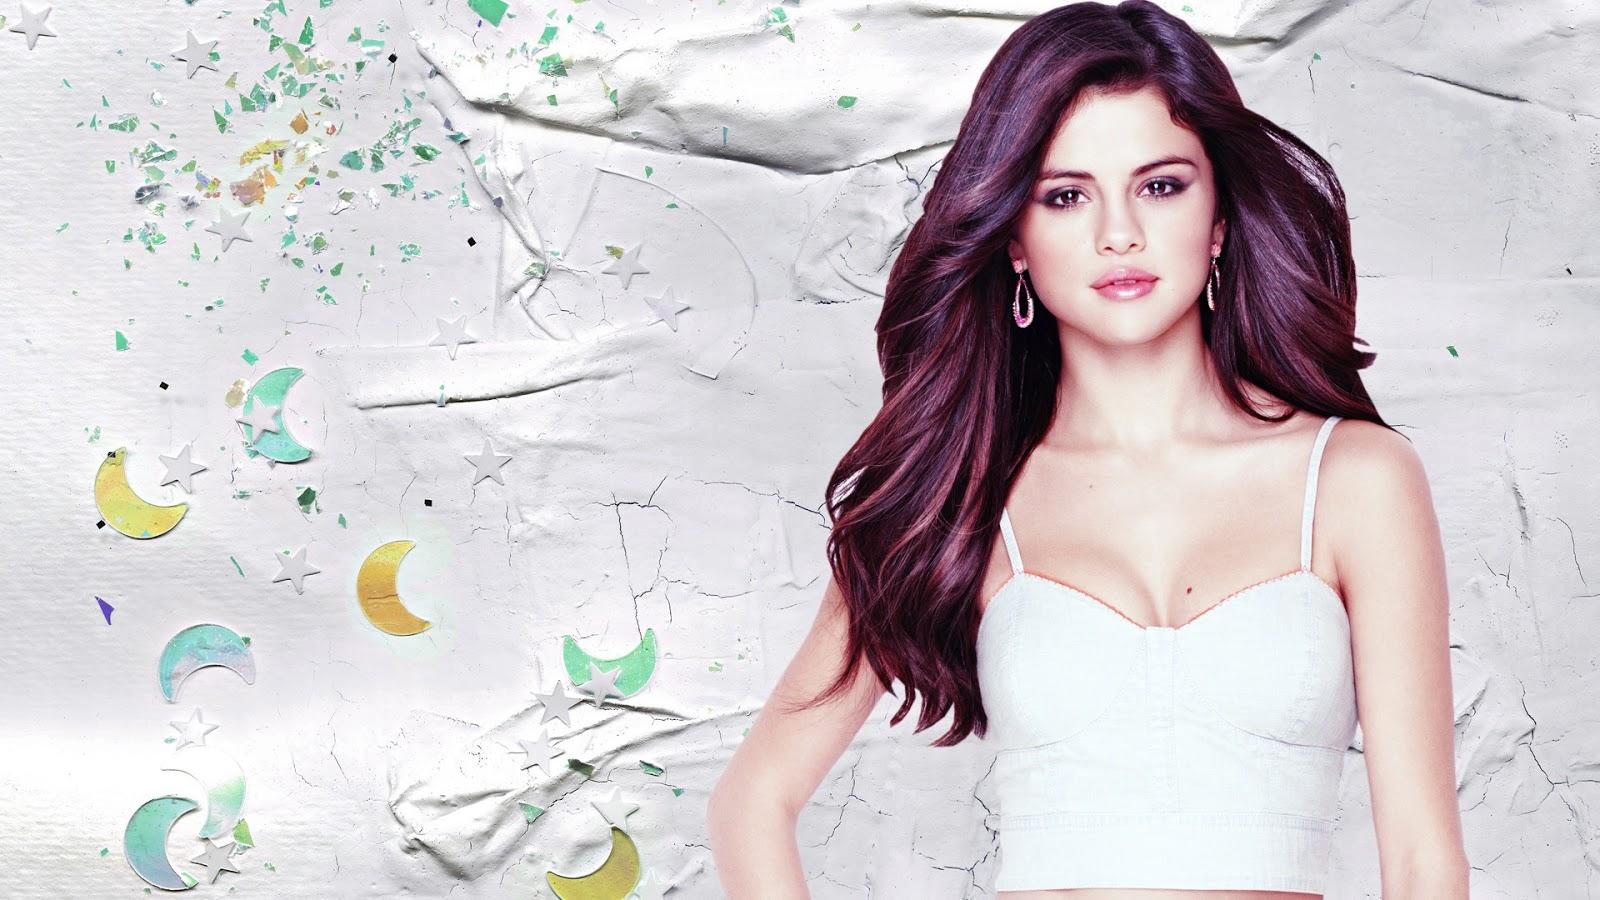 Selena Gomez Bikini Wallpaper 1080p